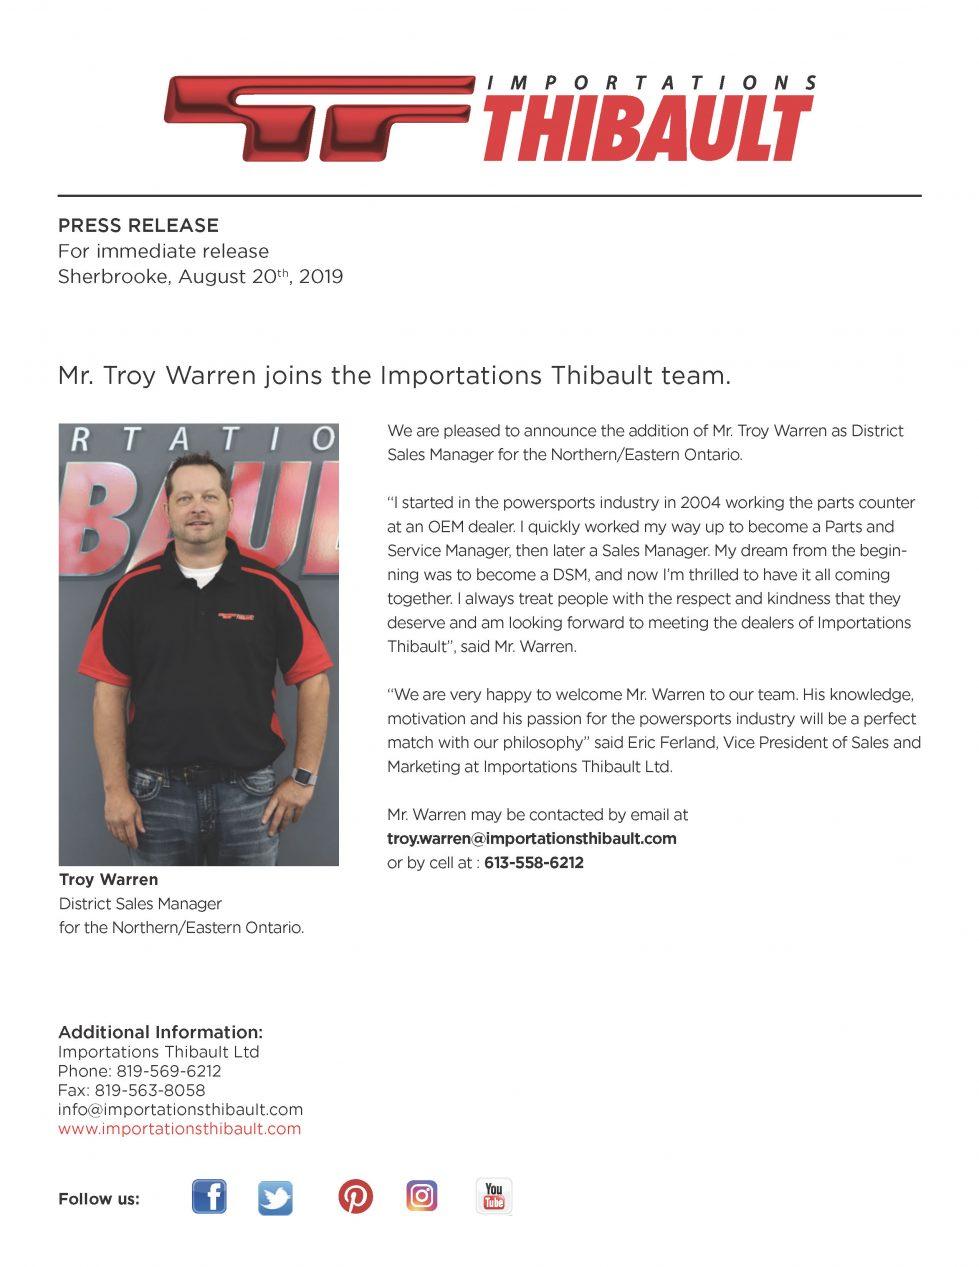 Mr. Troy Warren joins the Importations Thibault team.